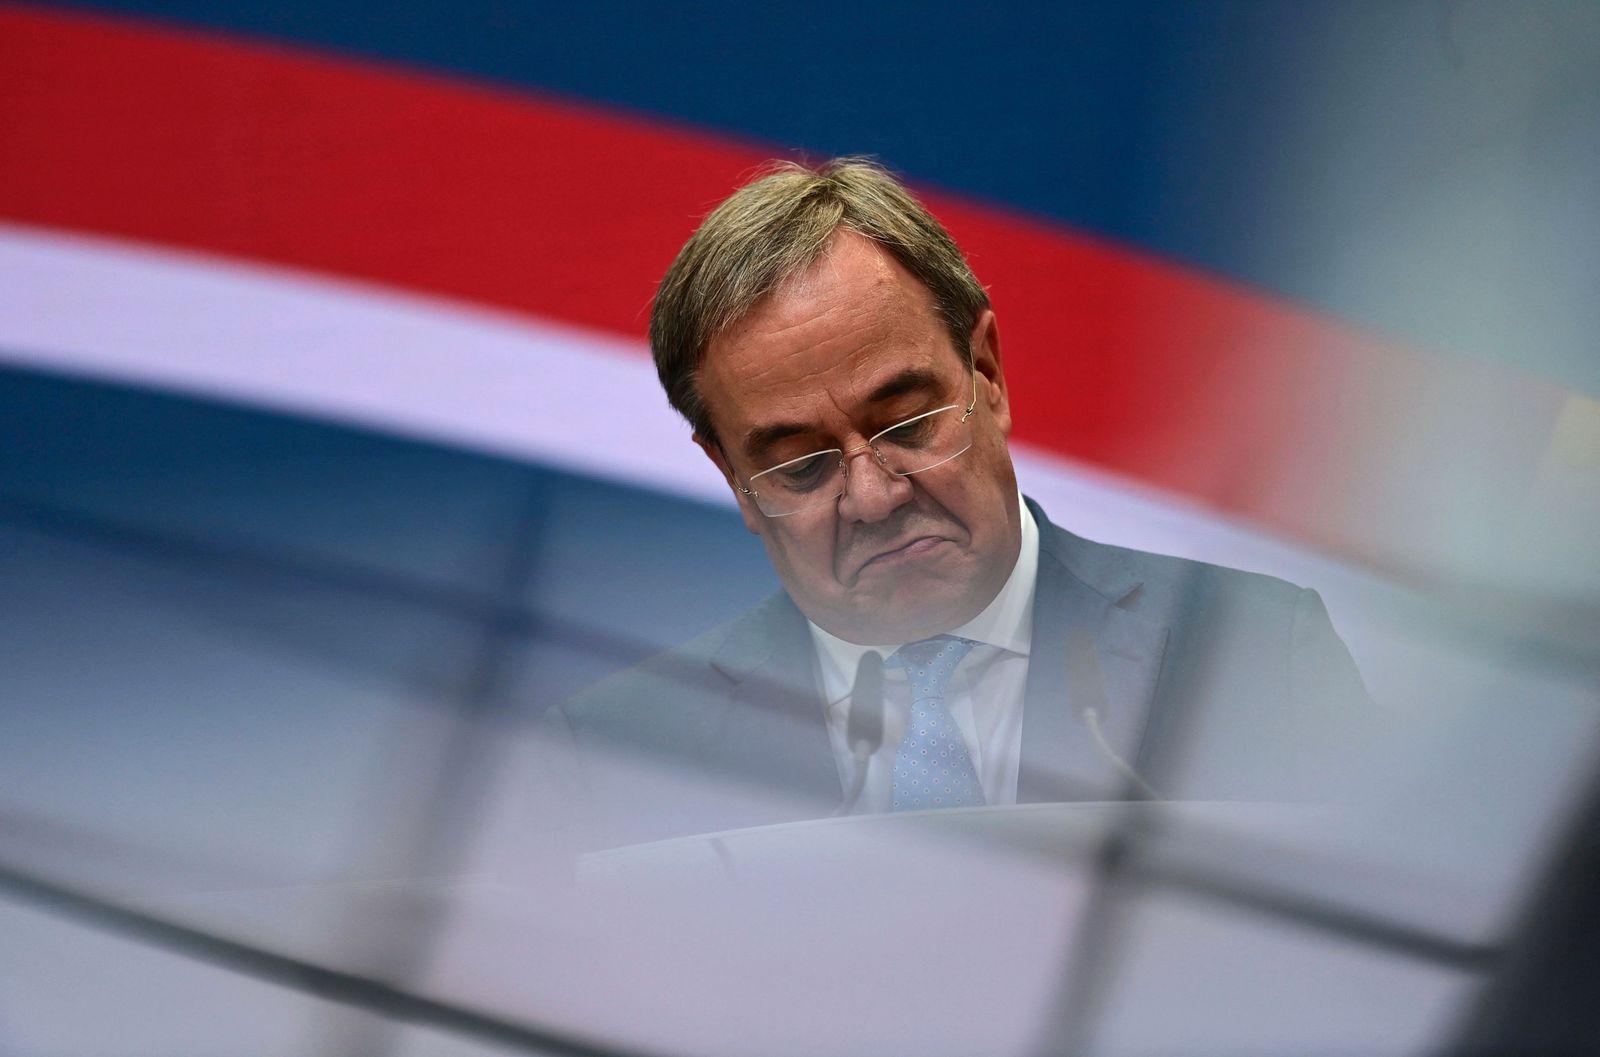 GERMANY-POLITICS-VOTE-PARTY-CDU